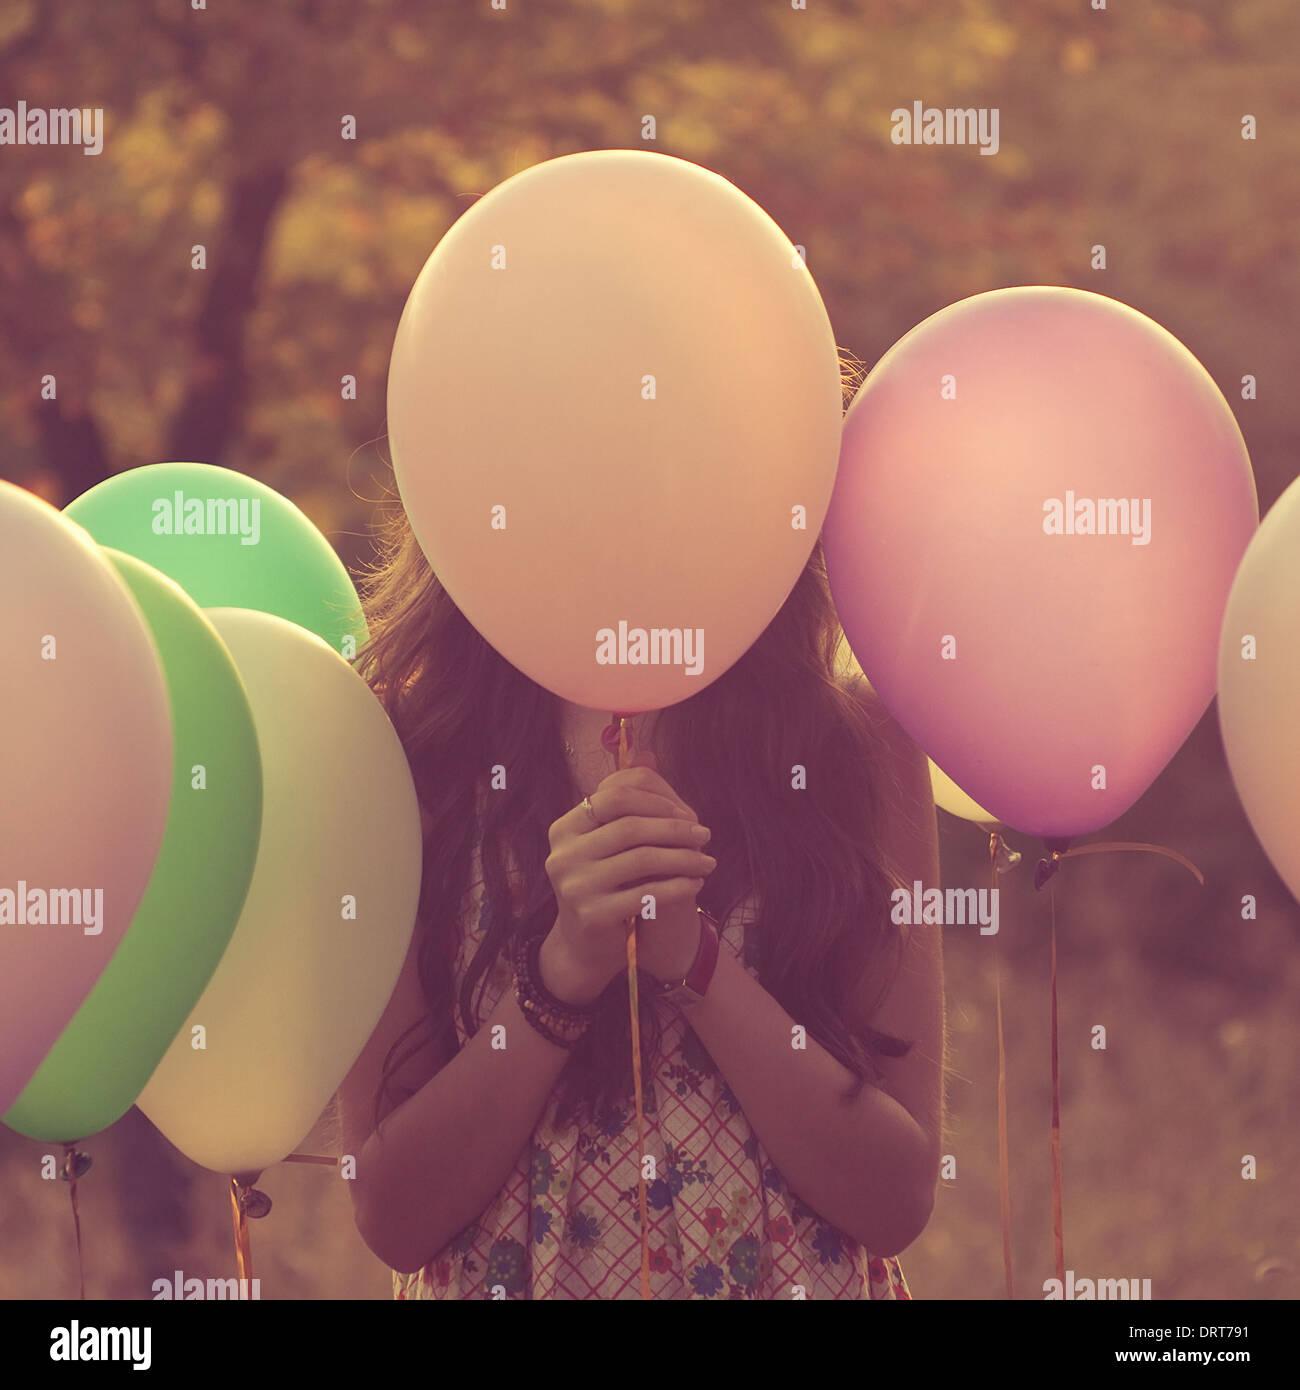 Girl hiding behind the balloon. Artistic portrait Stock Photo